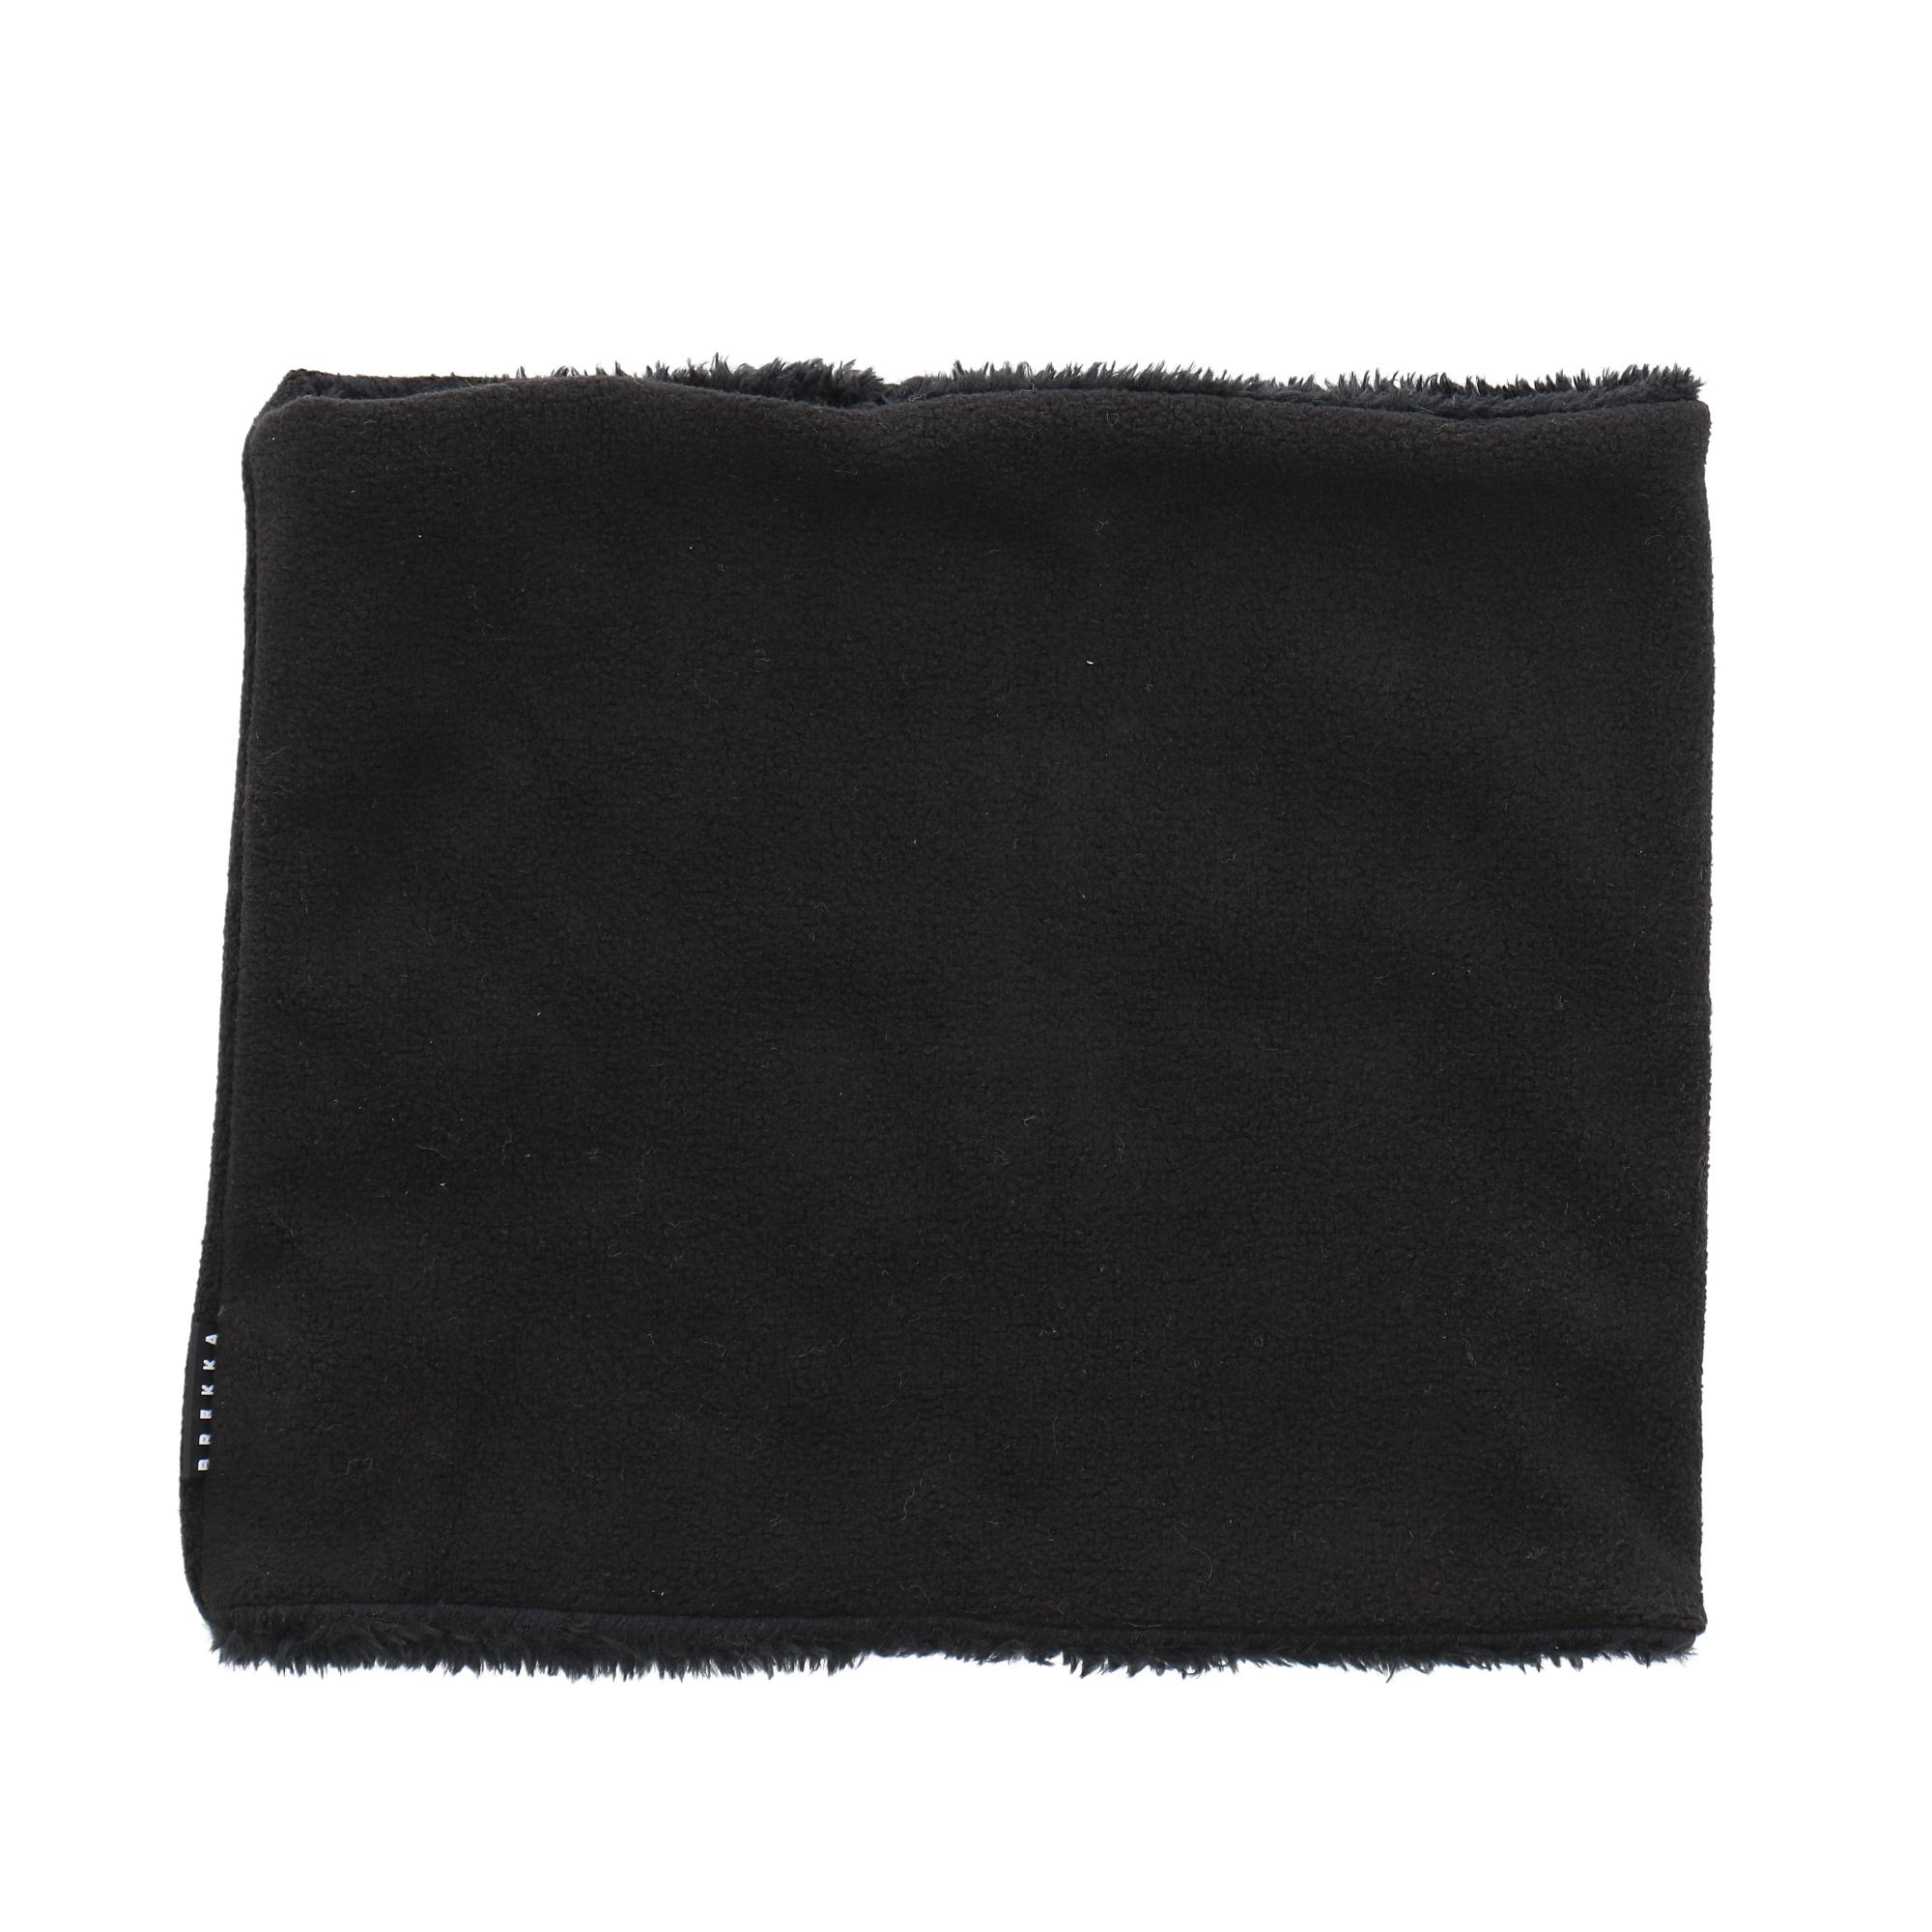 Brekka Double Fleece Neckwarmer Black